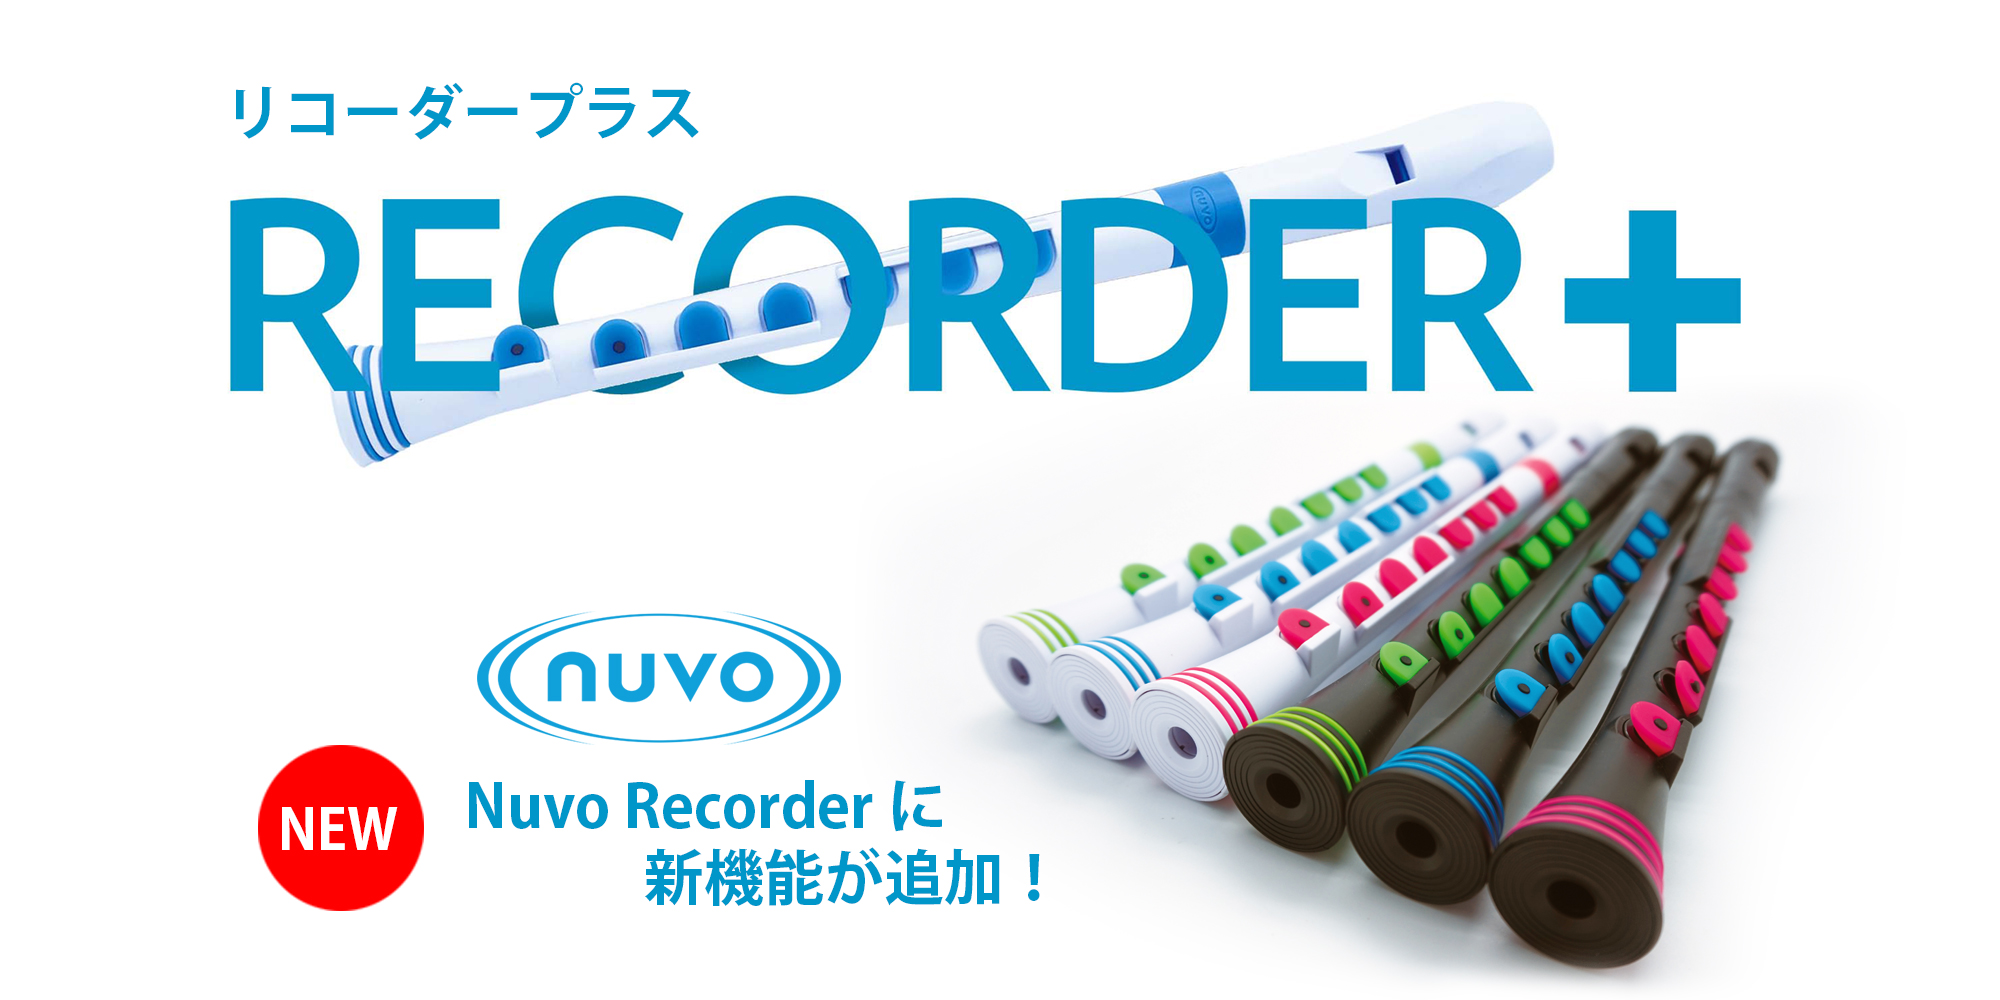 Nuvo Recorder+ 新発売!